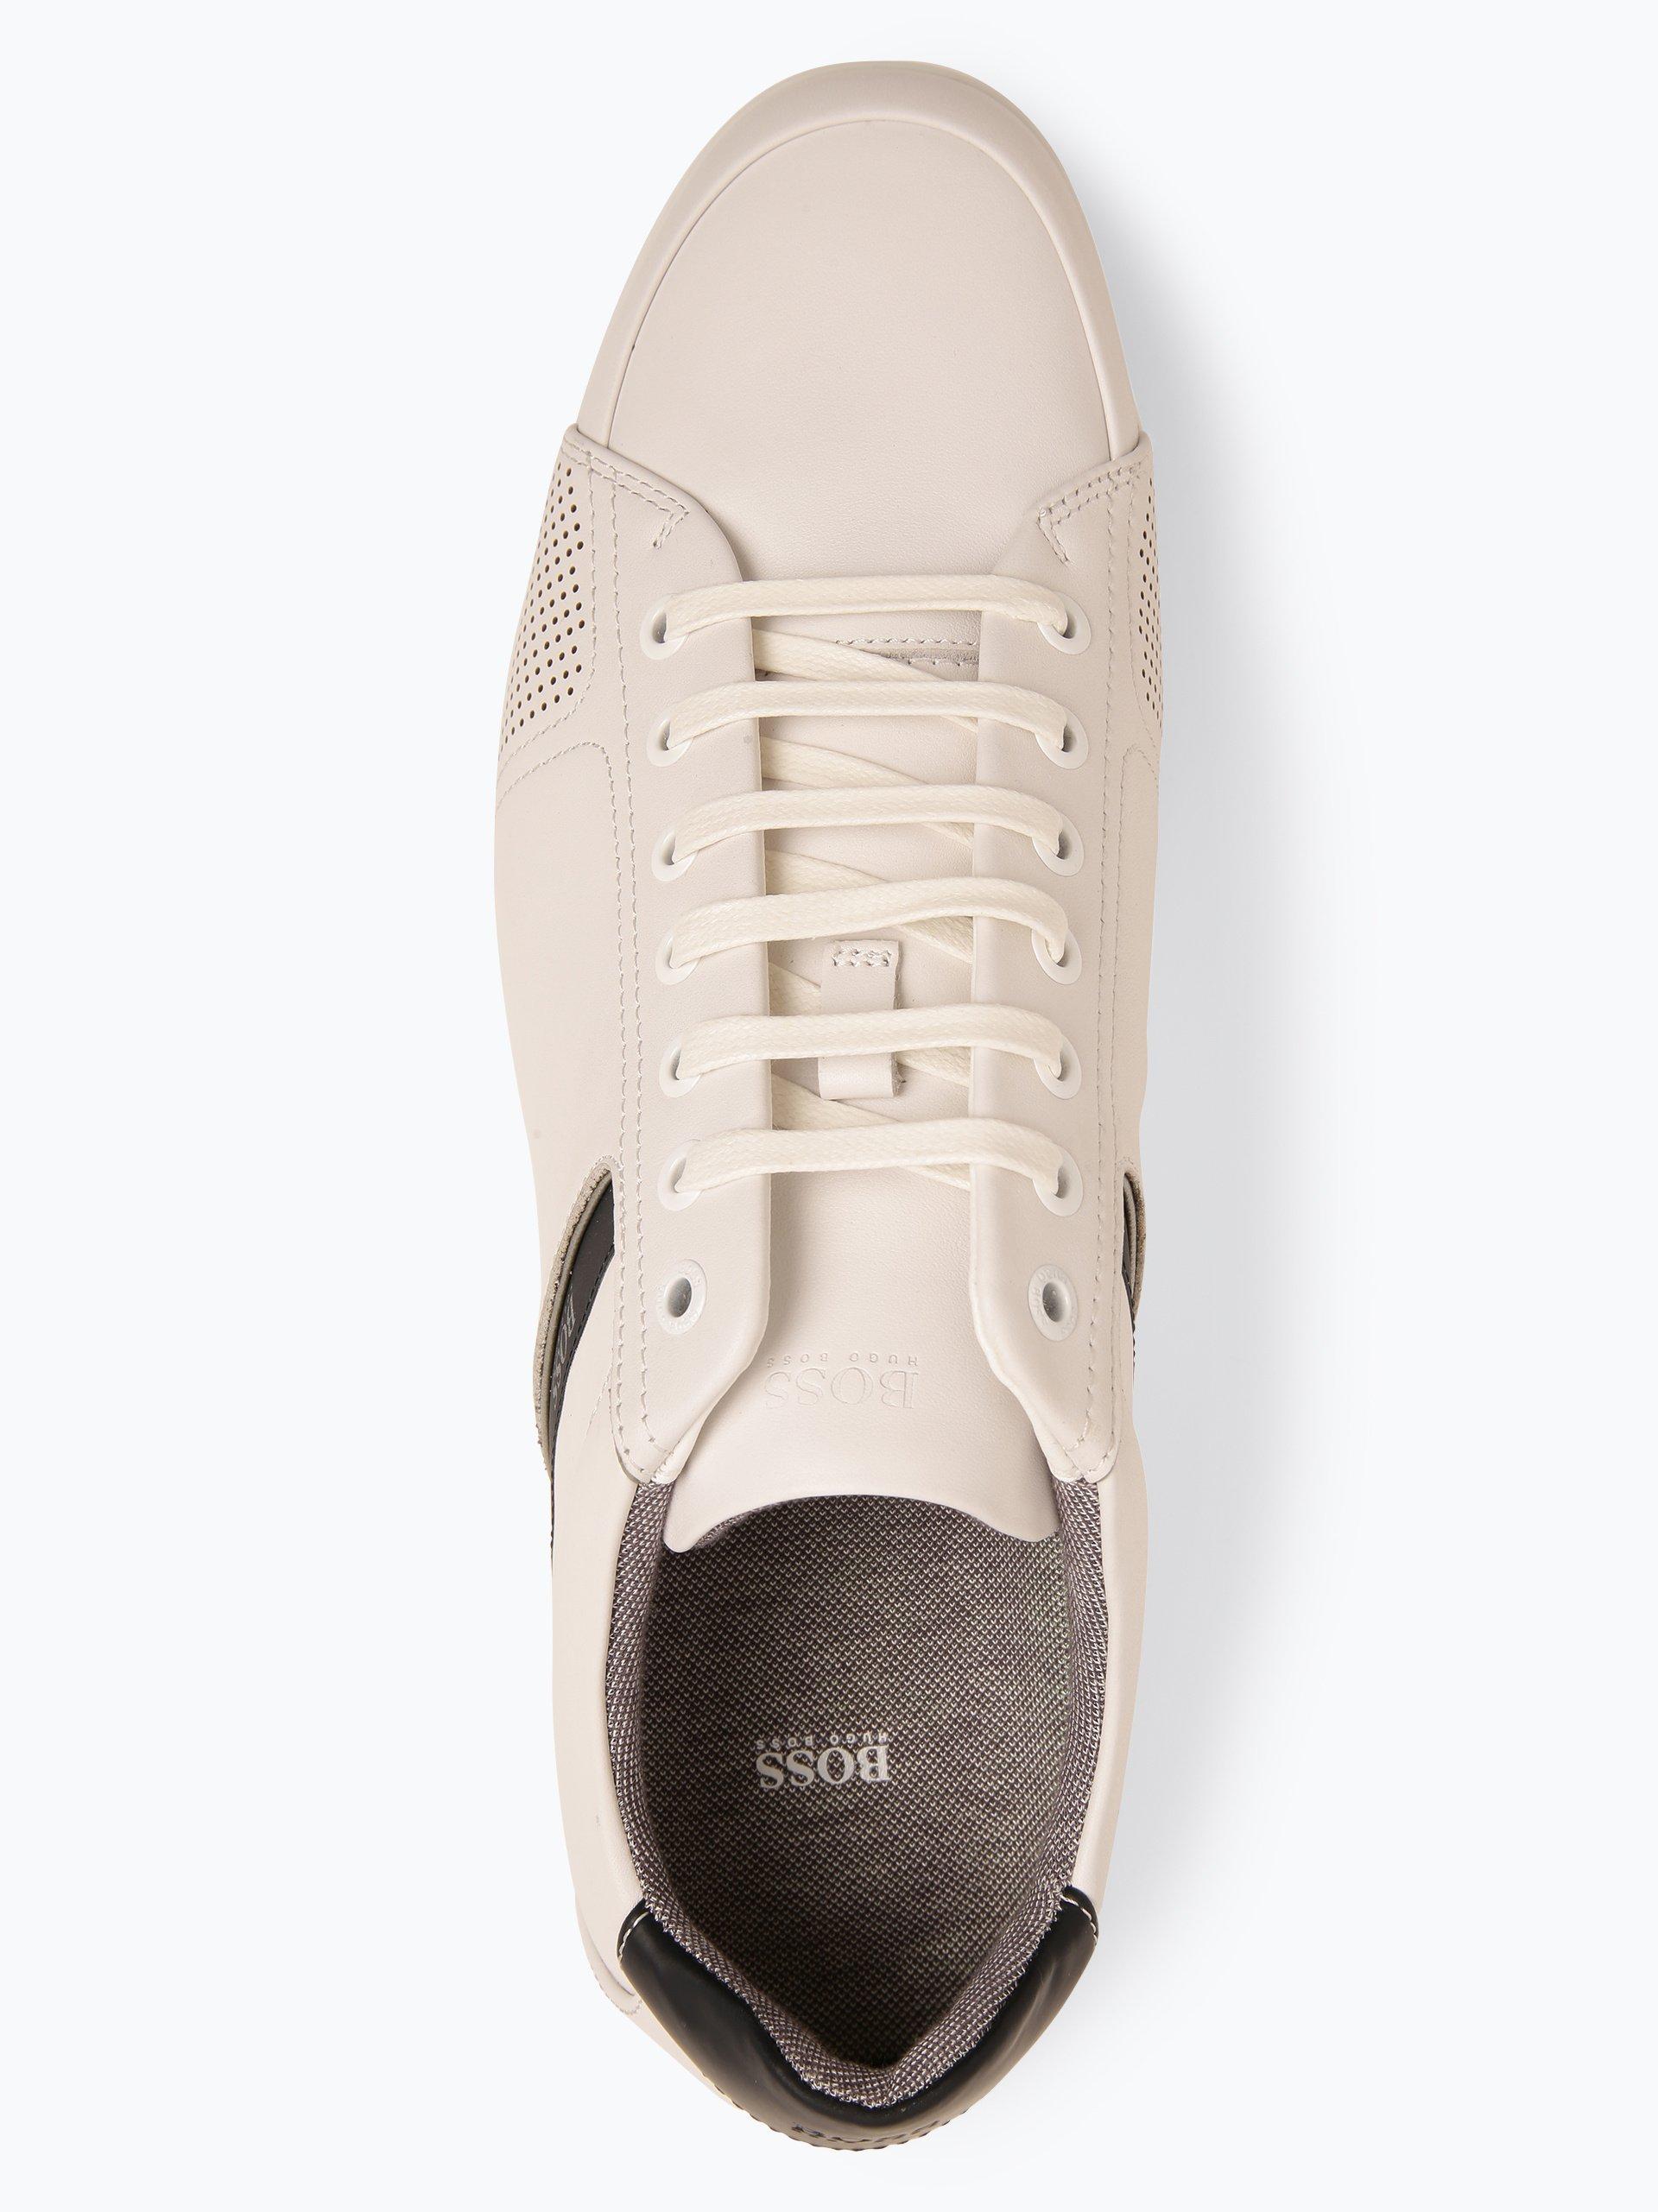 BOSS Athleisure Herren Sneaker aus Leder - Saturn_Lowp_lux4